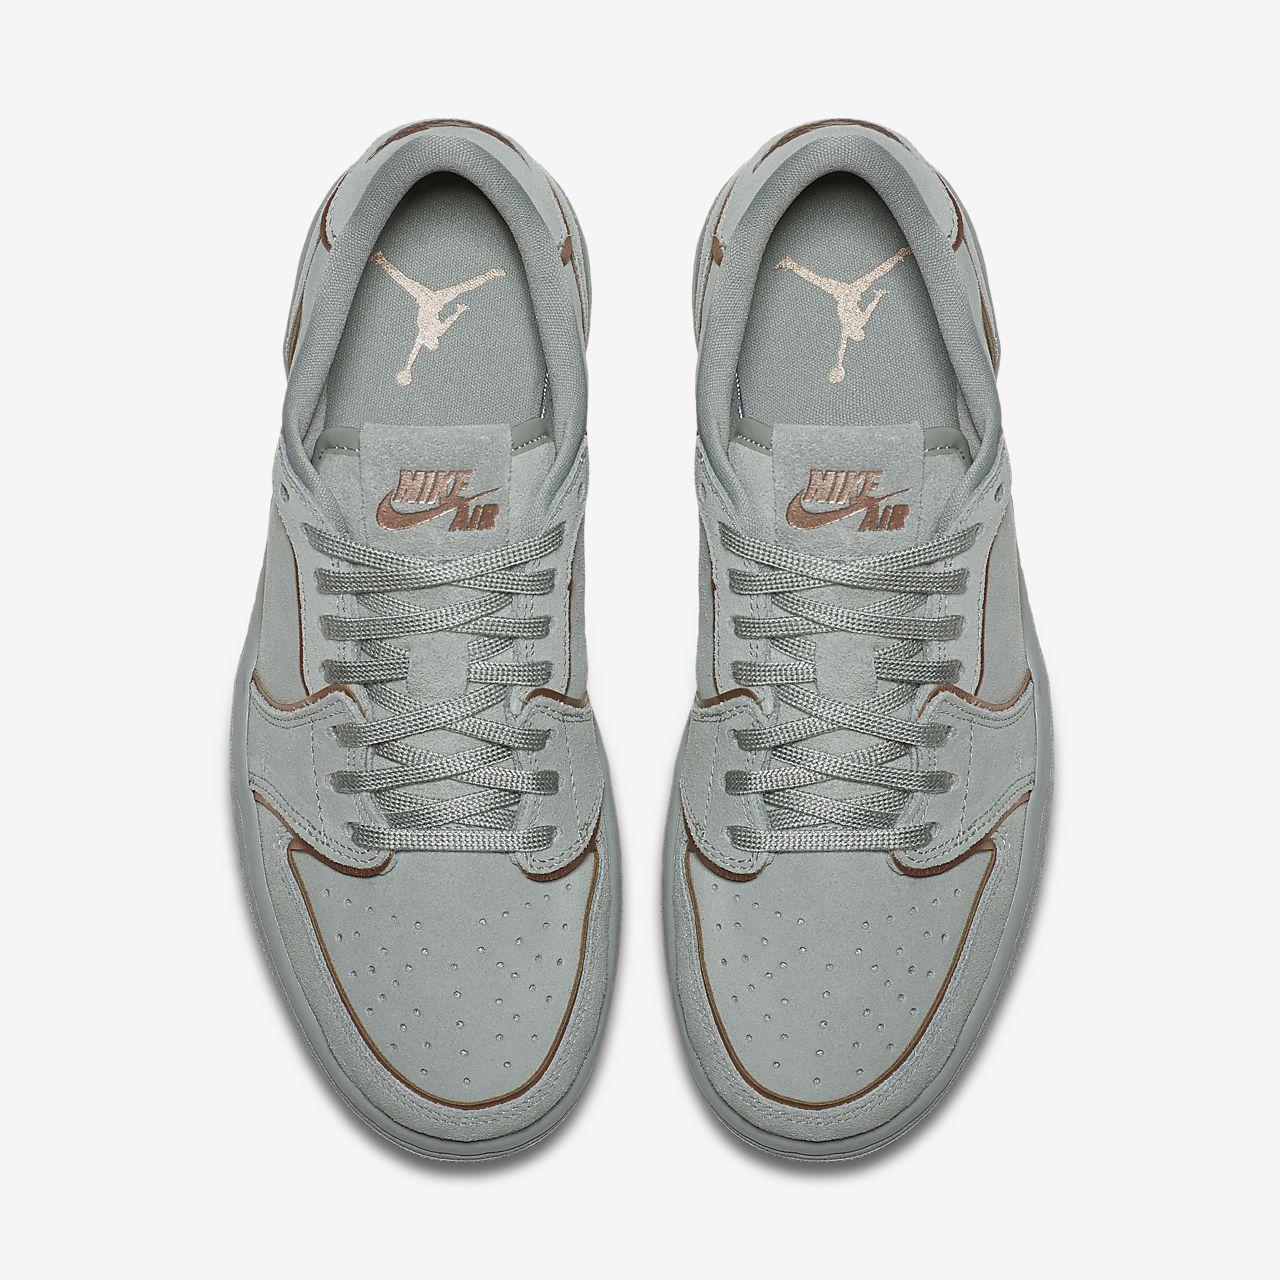 Calzado para mujer Air Jordan 1 Retro Low NS